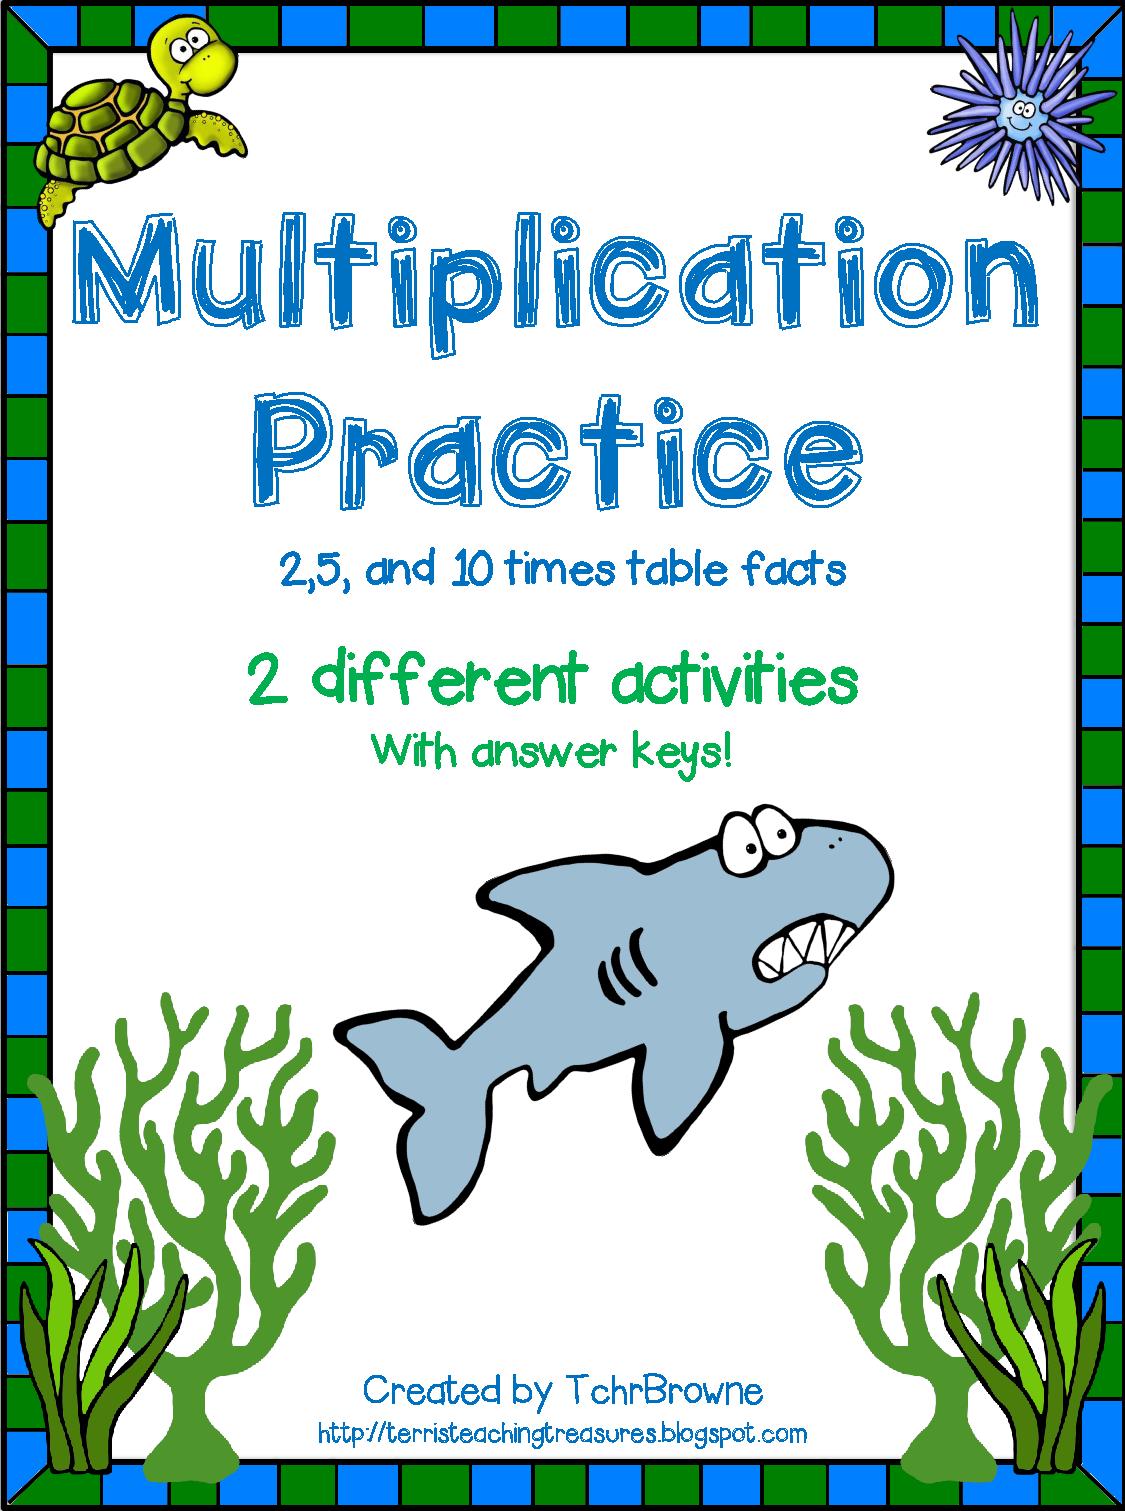 http://www.teacherspayteachers.com/Product/Multiplication-Practice-2510-times-tables-1335976